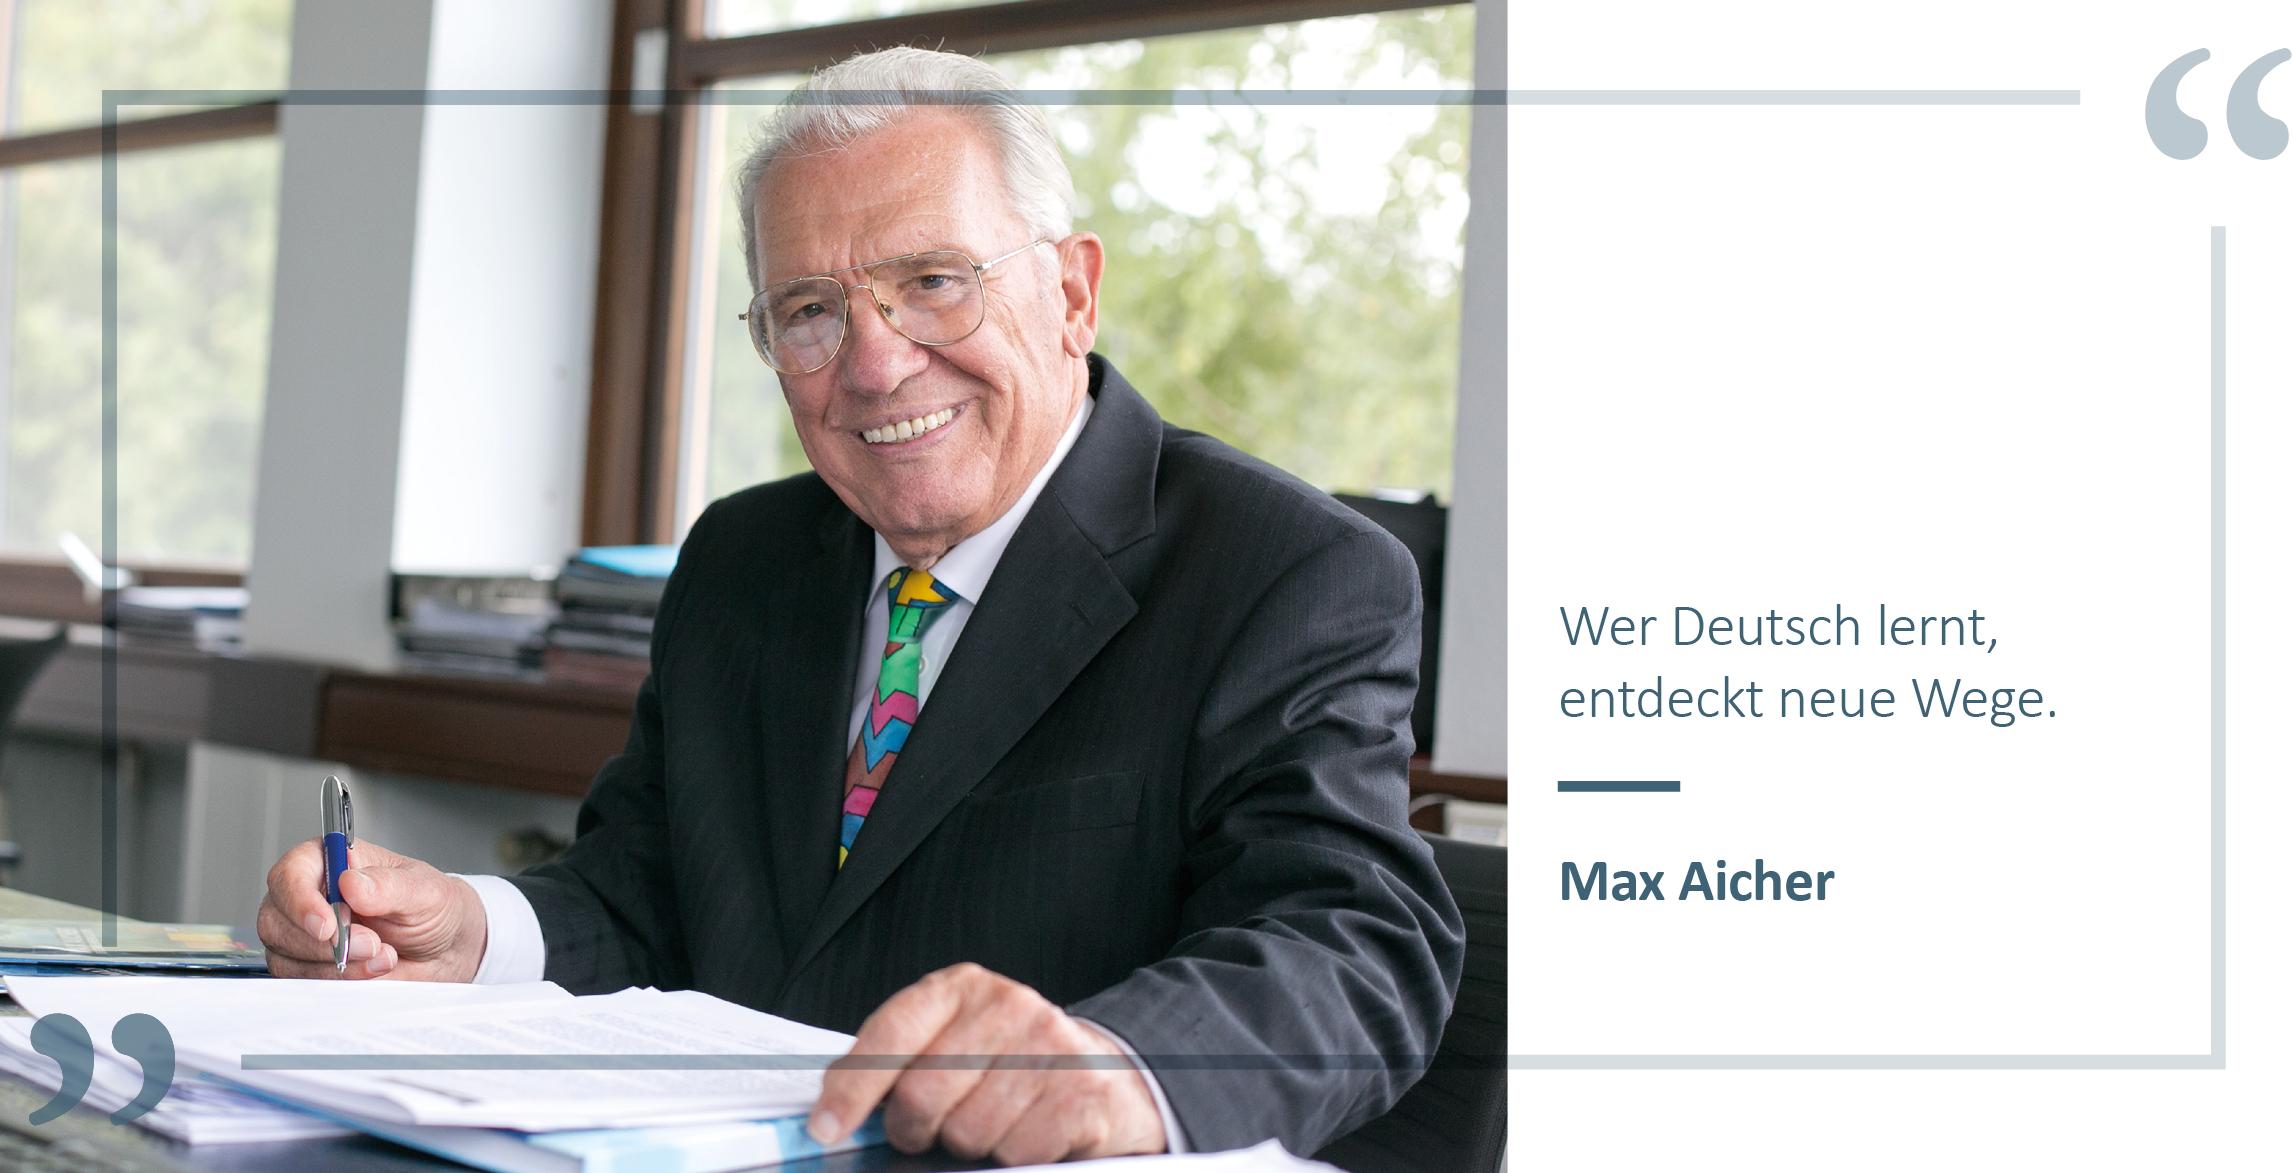 Zitat Max Aicher Über Uns